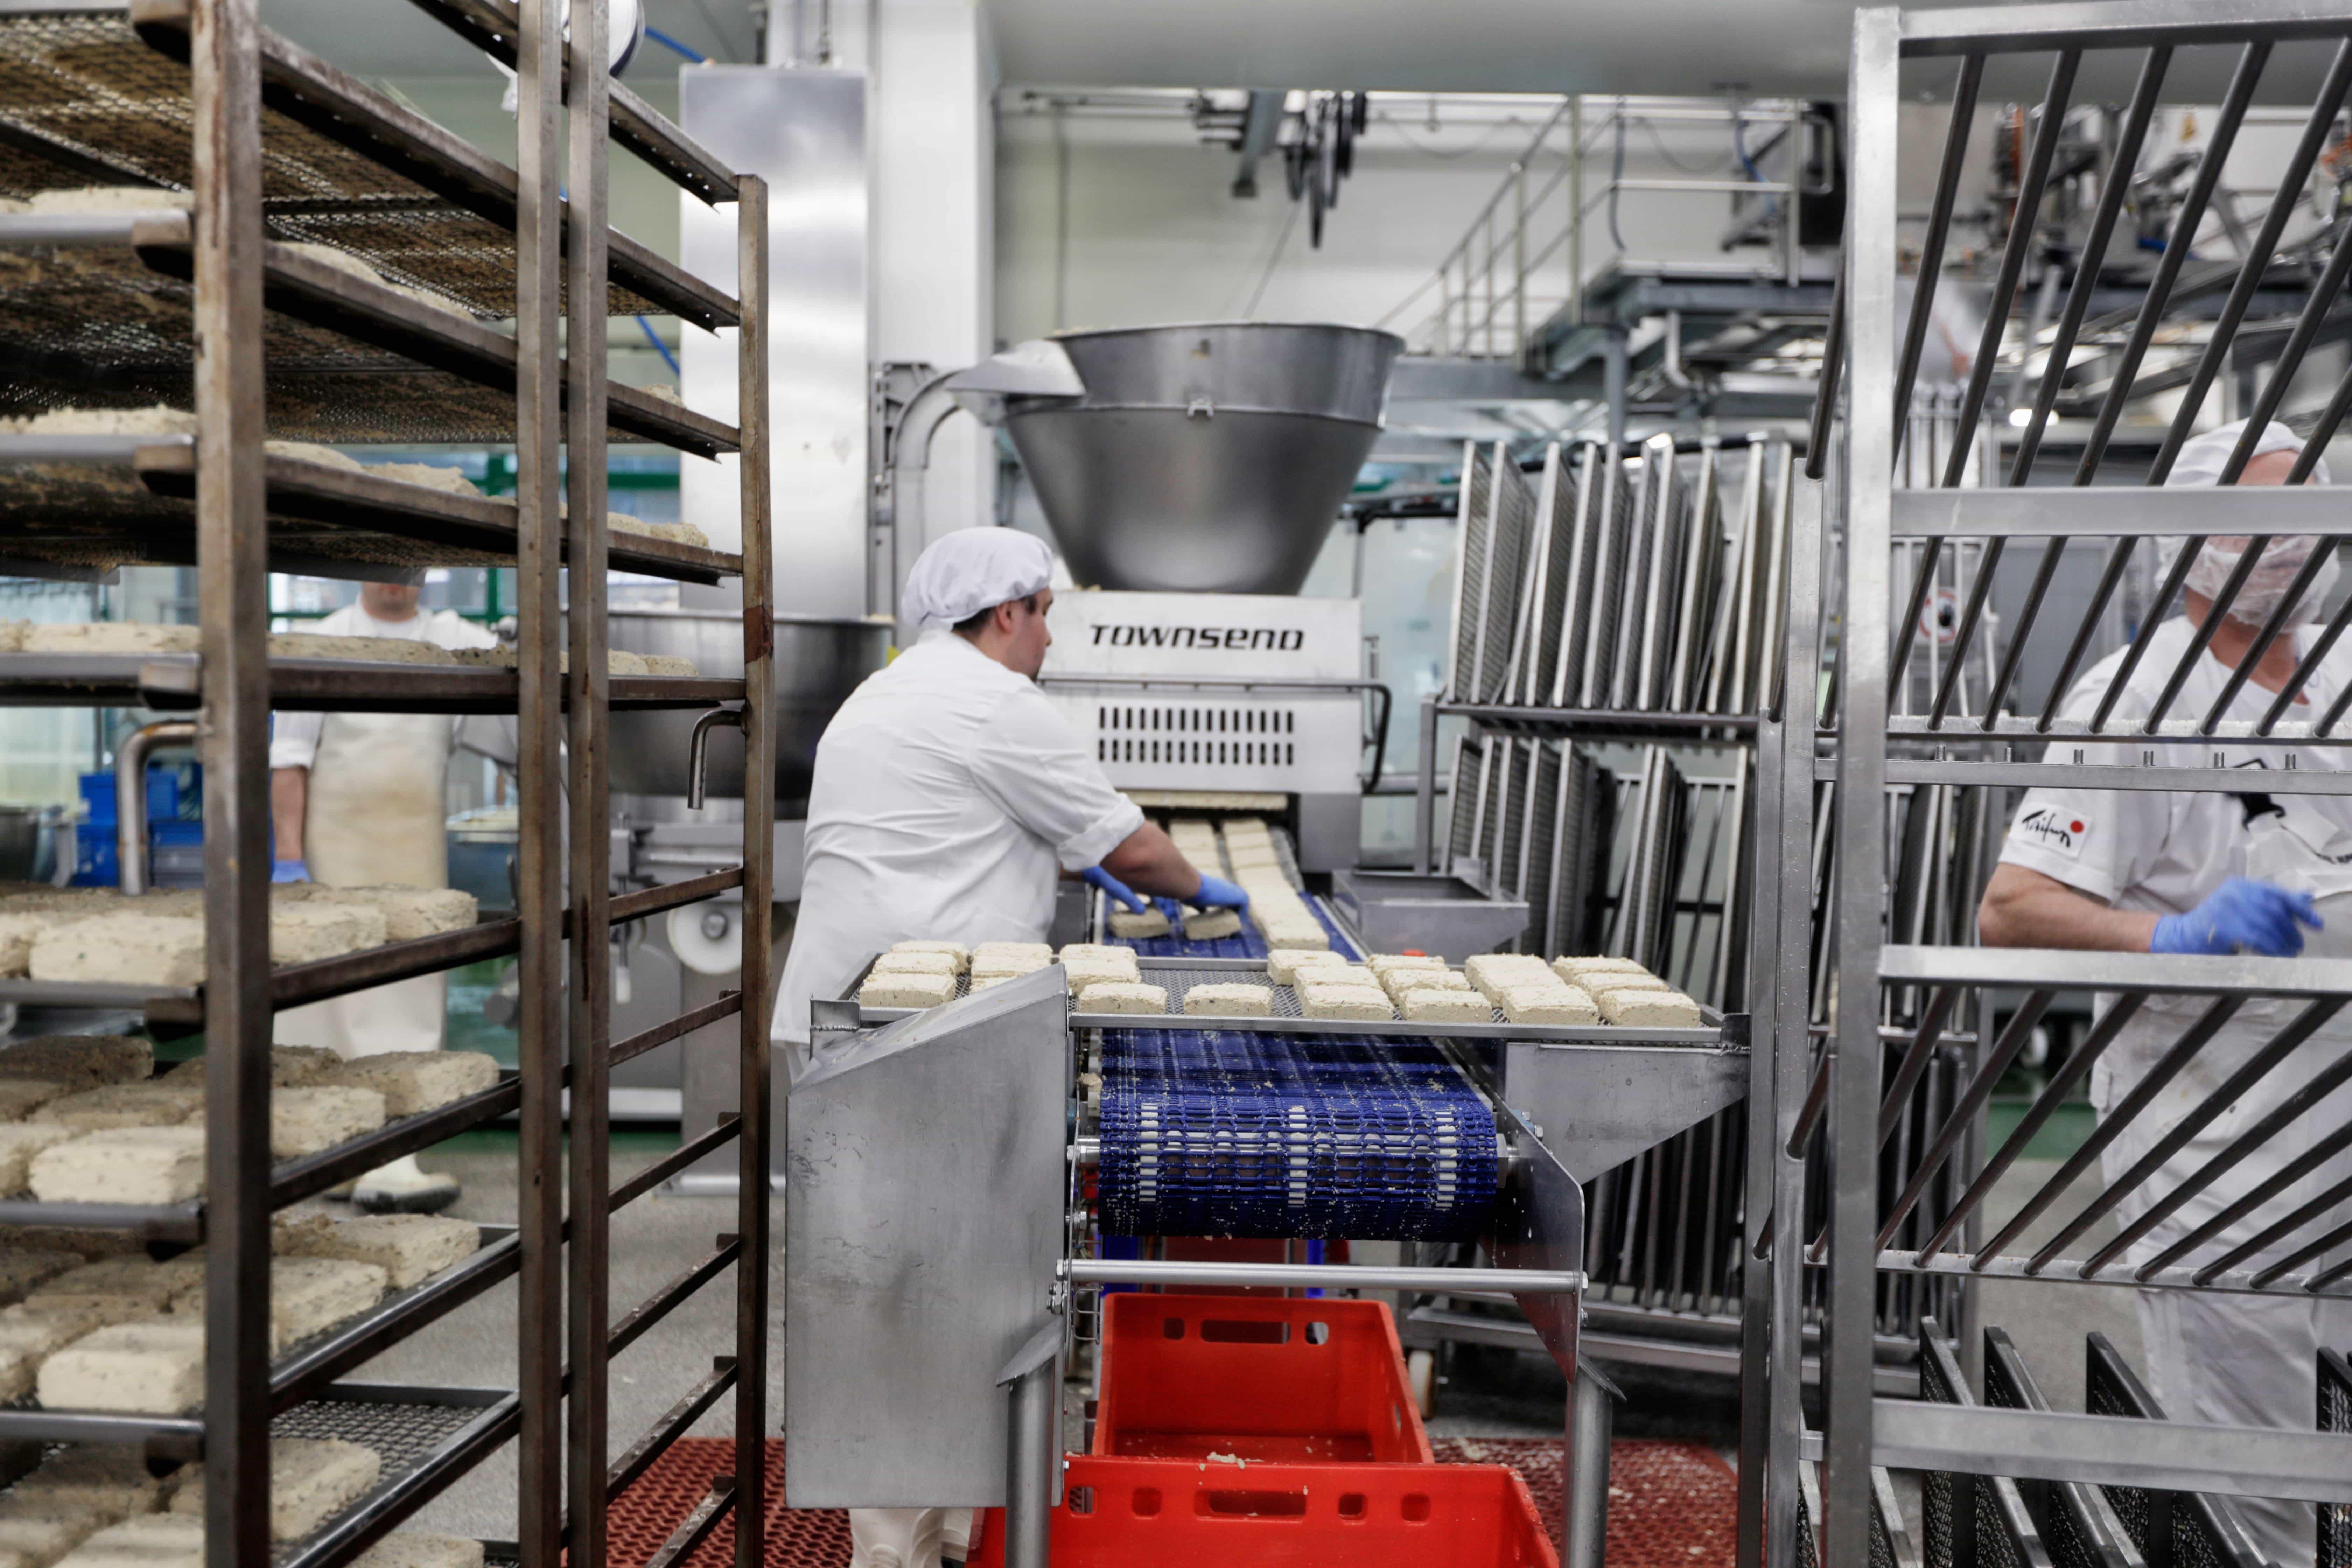 Tofu factory, person putting tofu onto conveyor belt